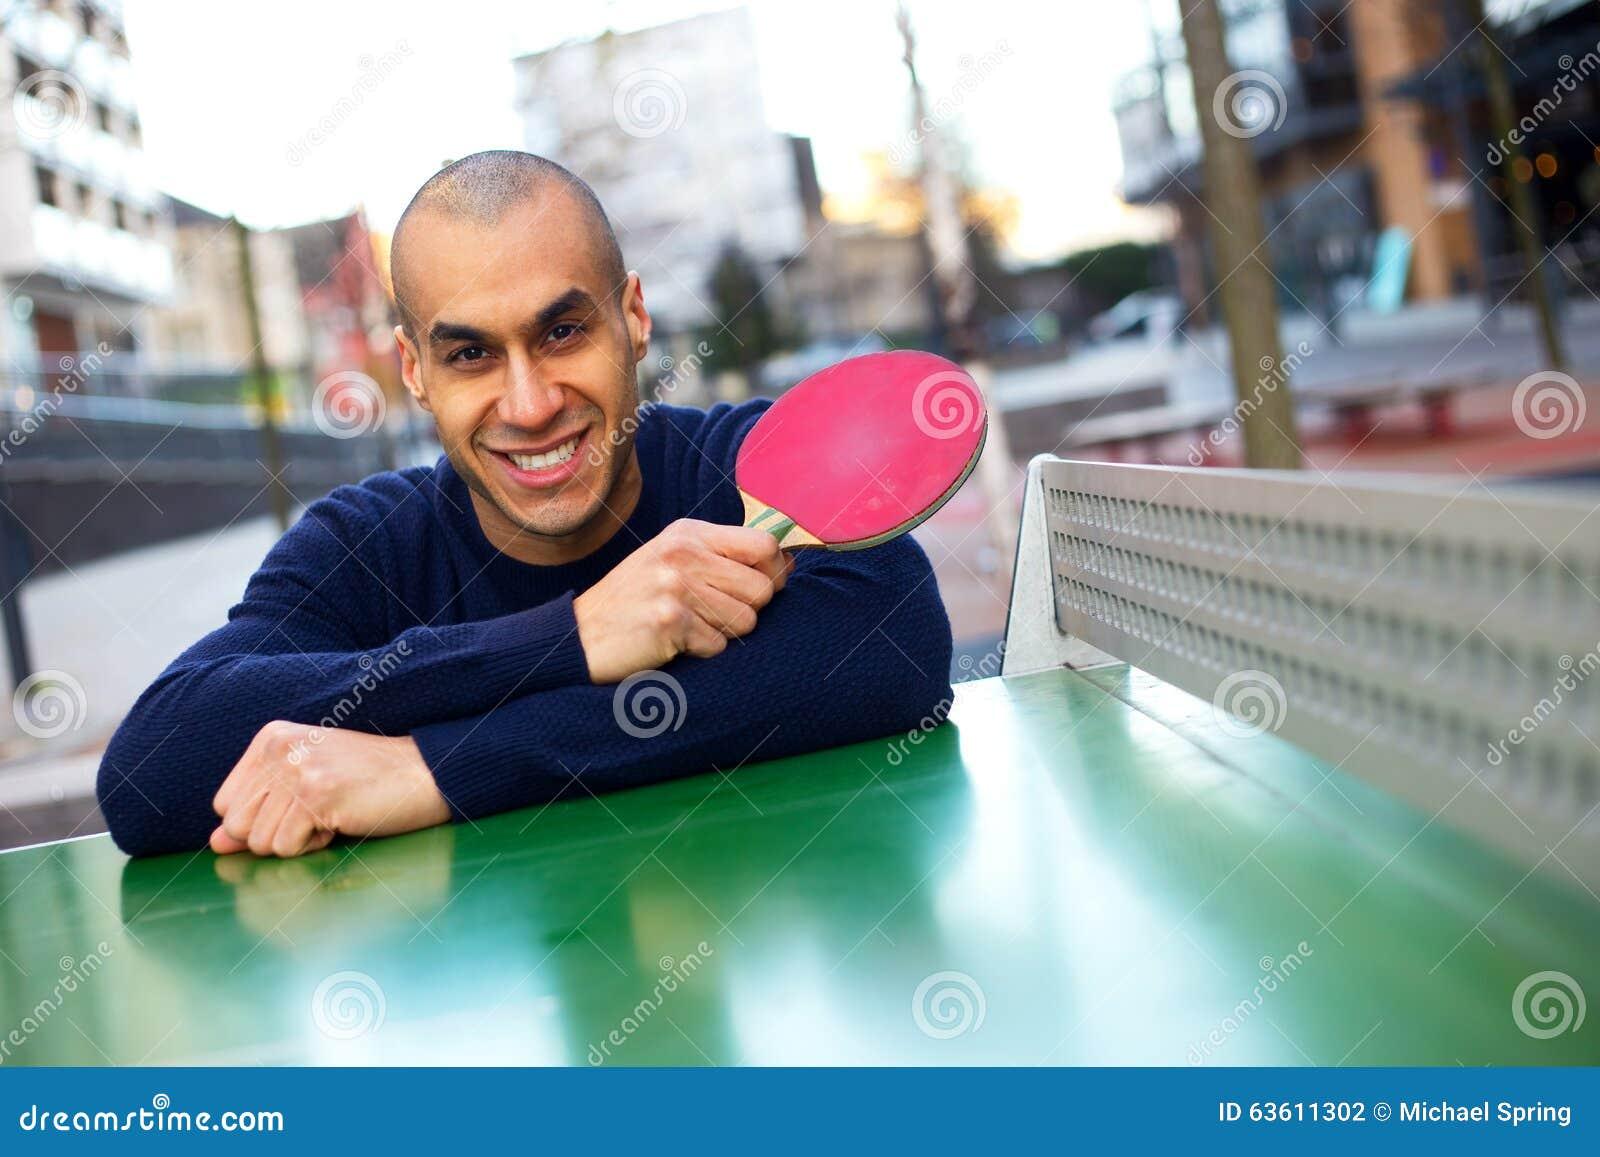 Jouer au ping-pong